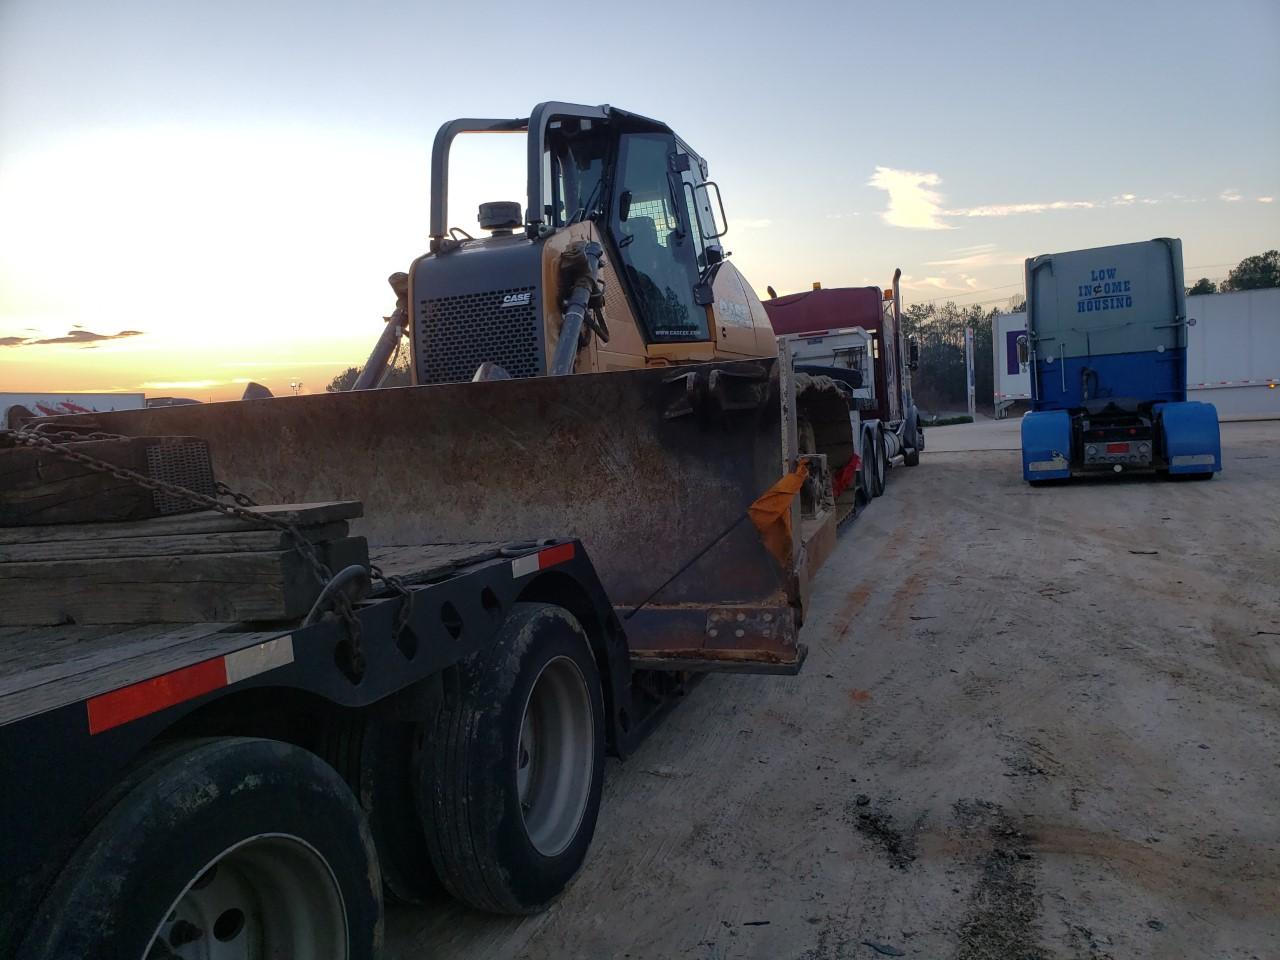 Alabama bulldozer transport